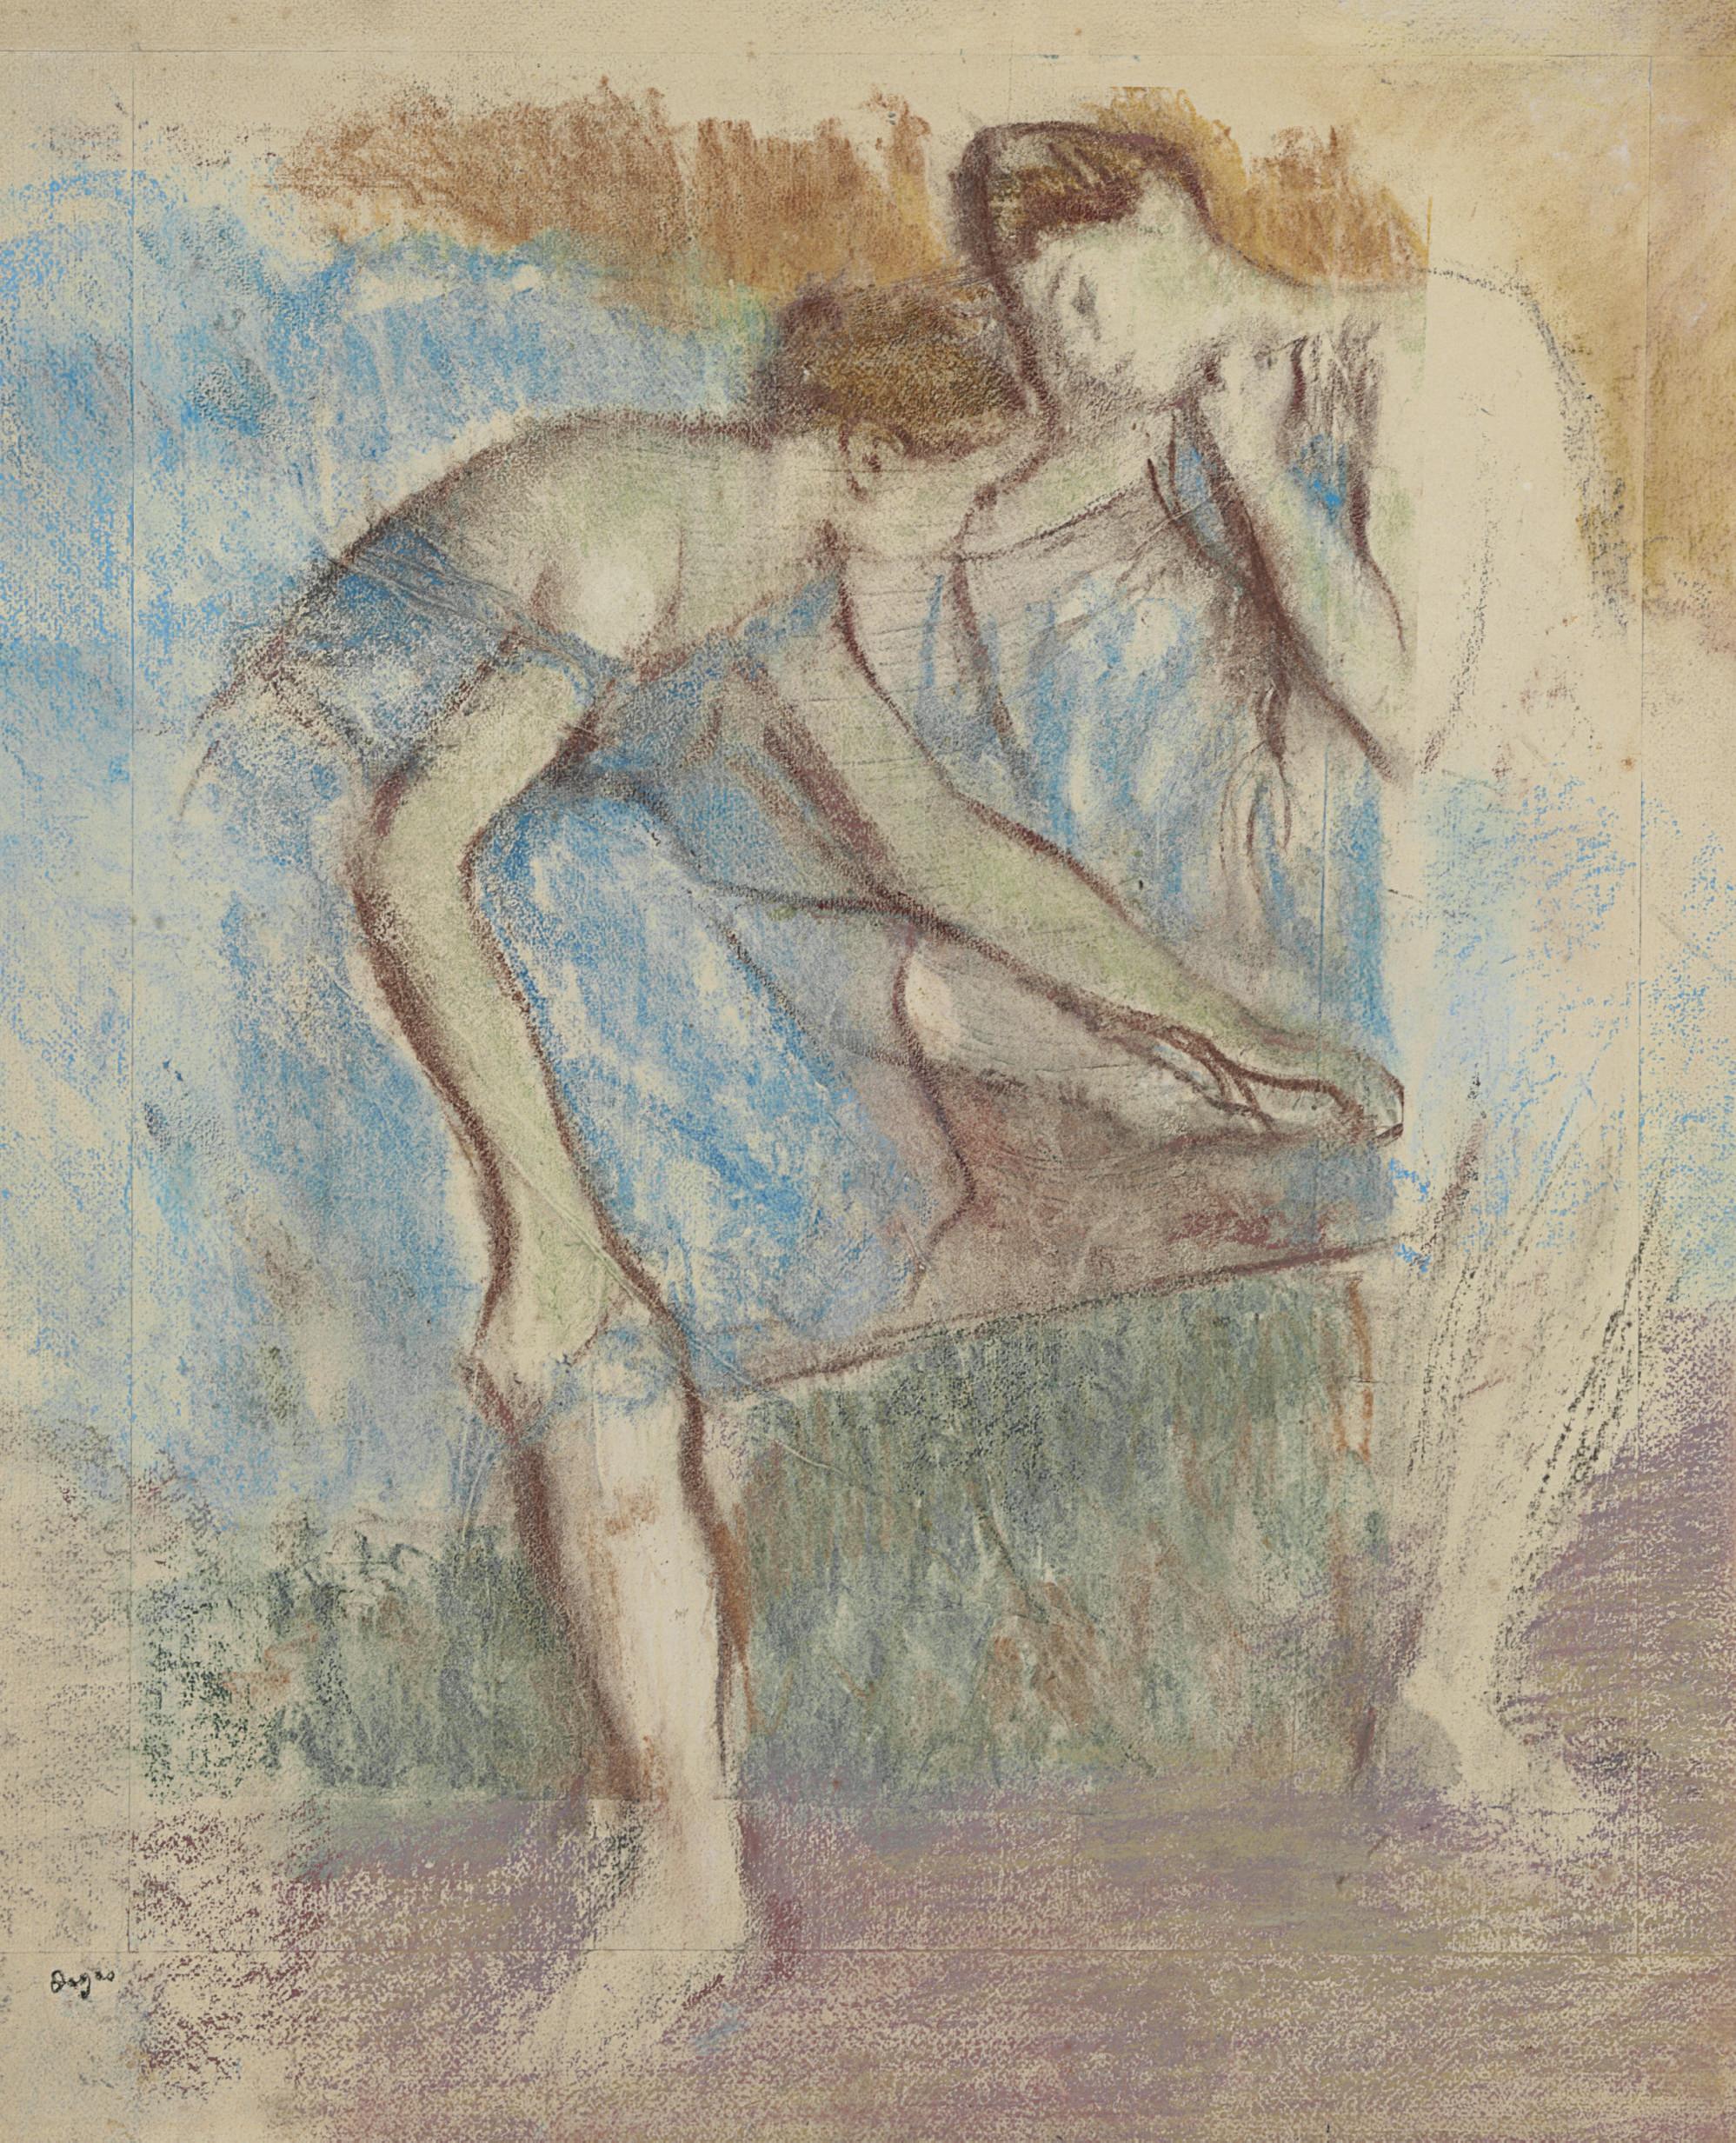 Edgar Degas (1834-1917)